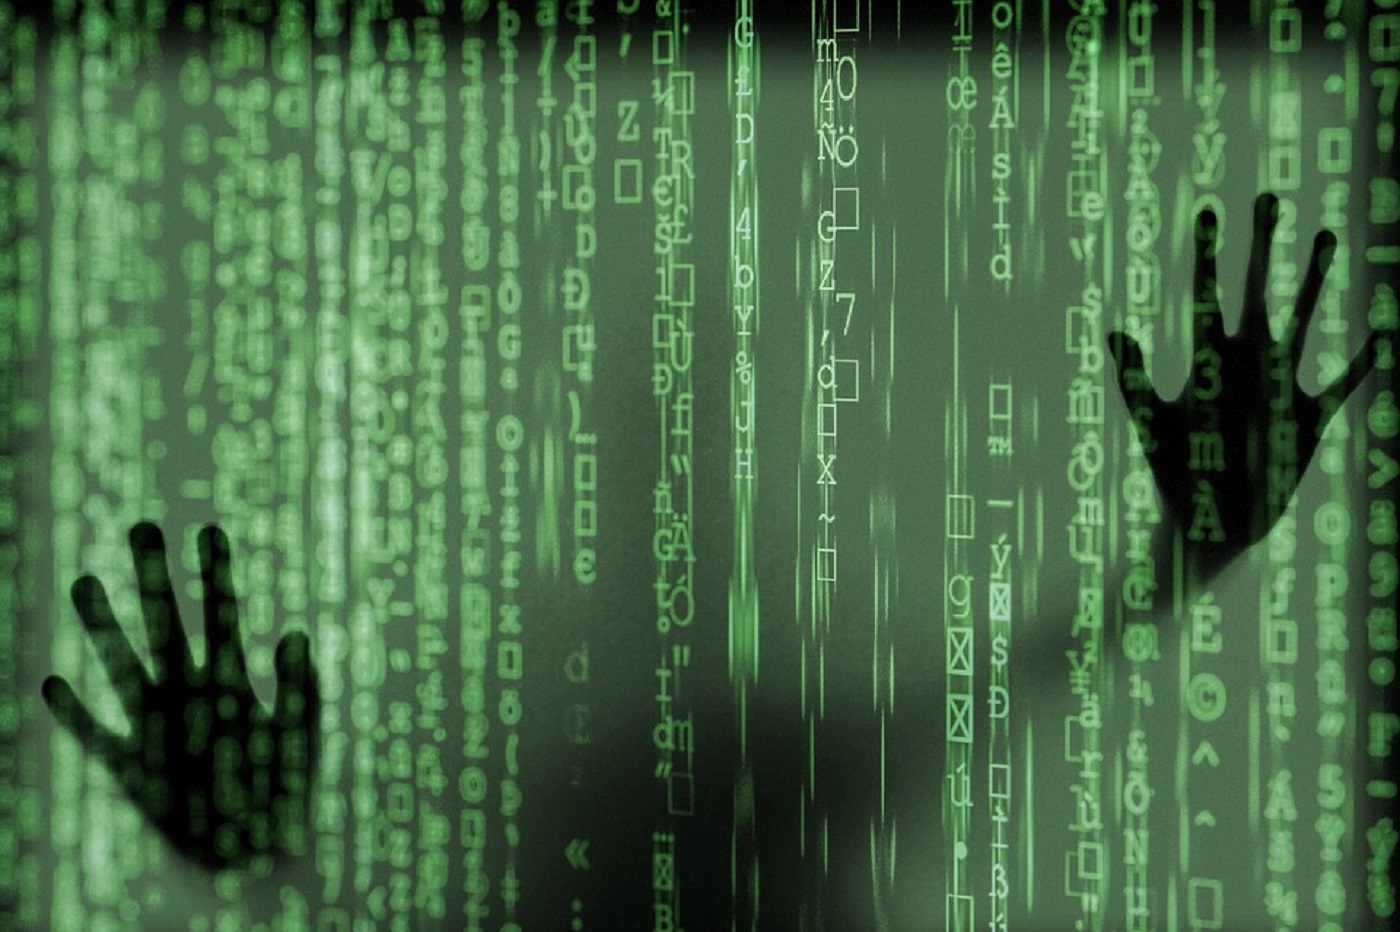 Hacker, pirate, faille de sécurité, code, cyberattaque, piratage